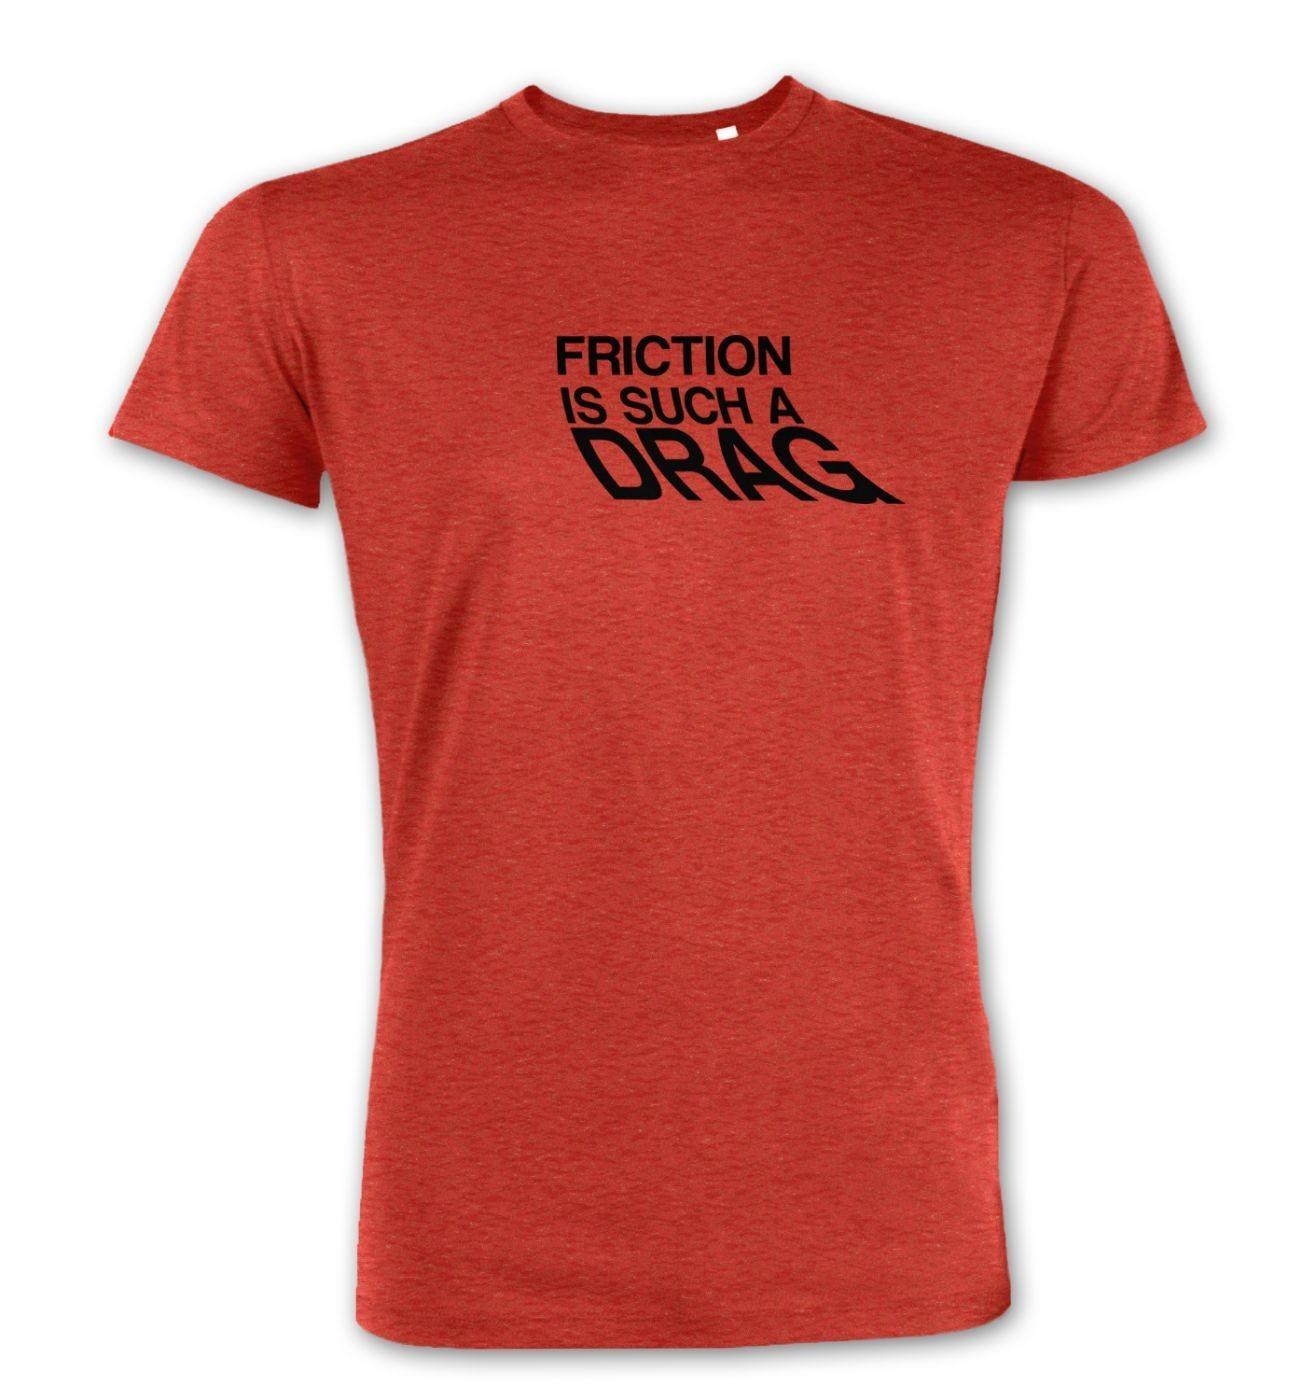 Friction Is Such A Drag men's Premium t-shirt